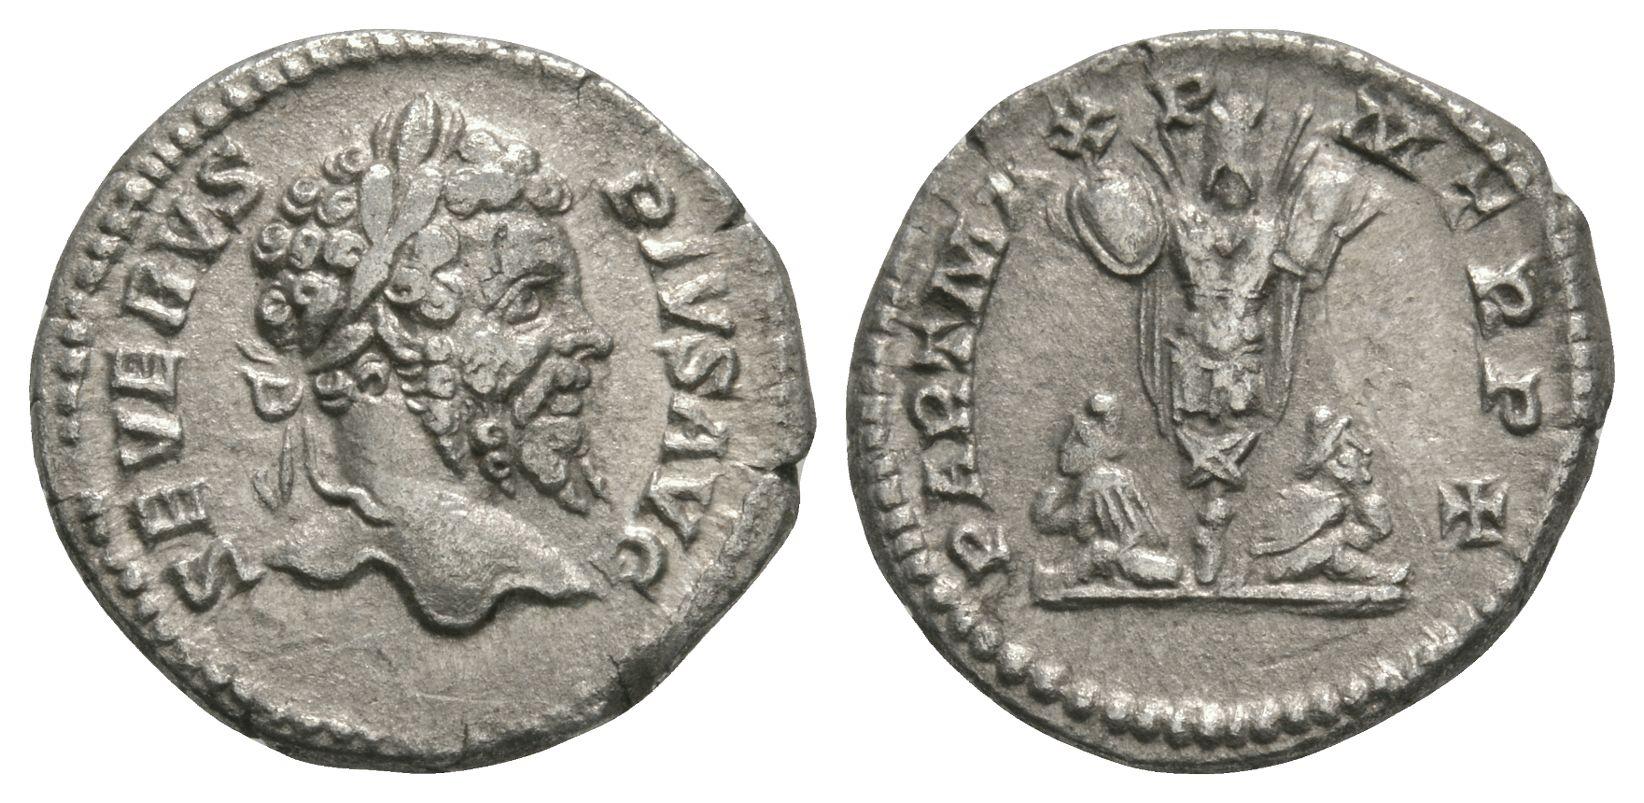 Ancient Roman Imperial Coins - Septimius Severus - Captives and Trophy Denarius